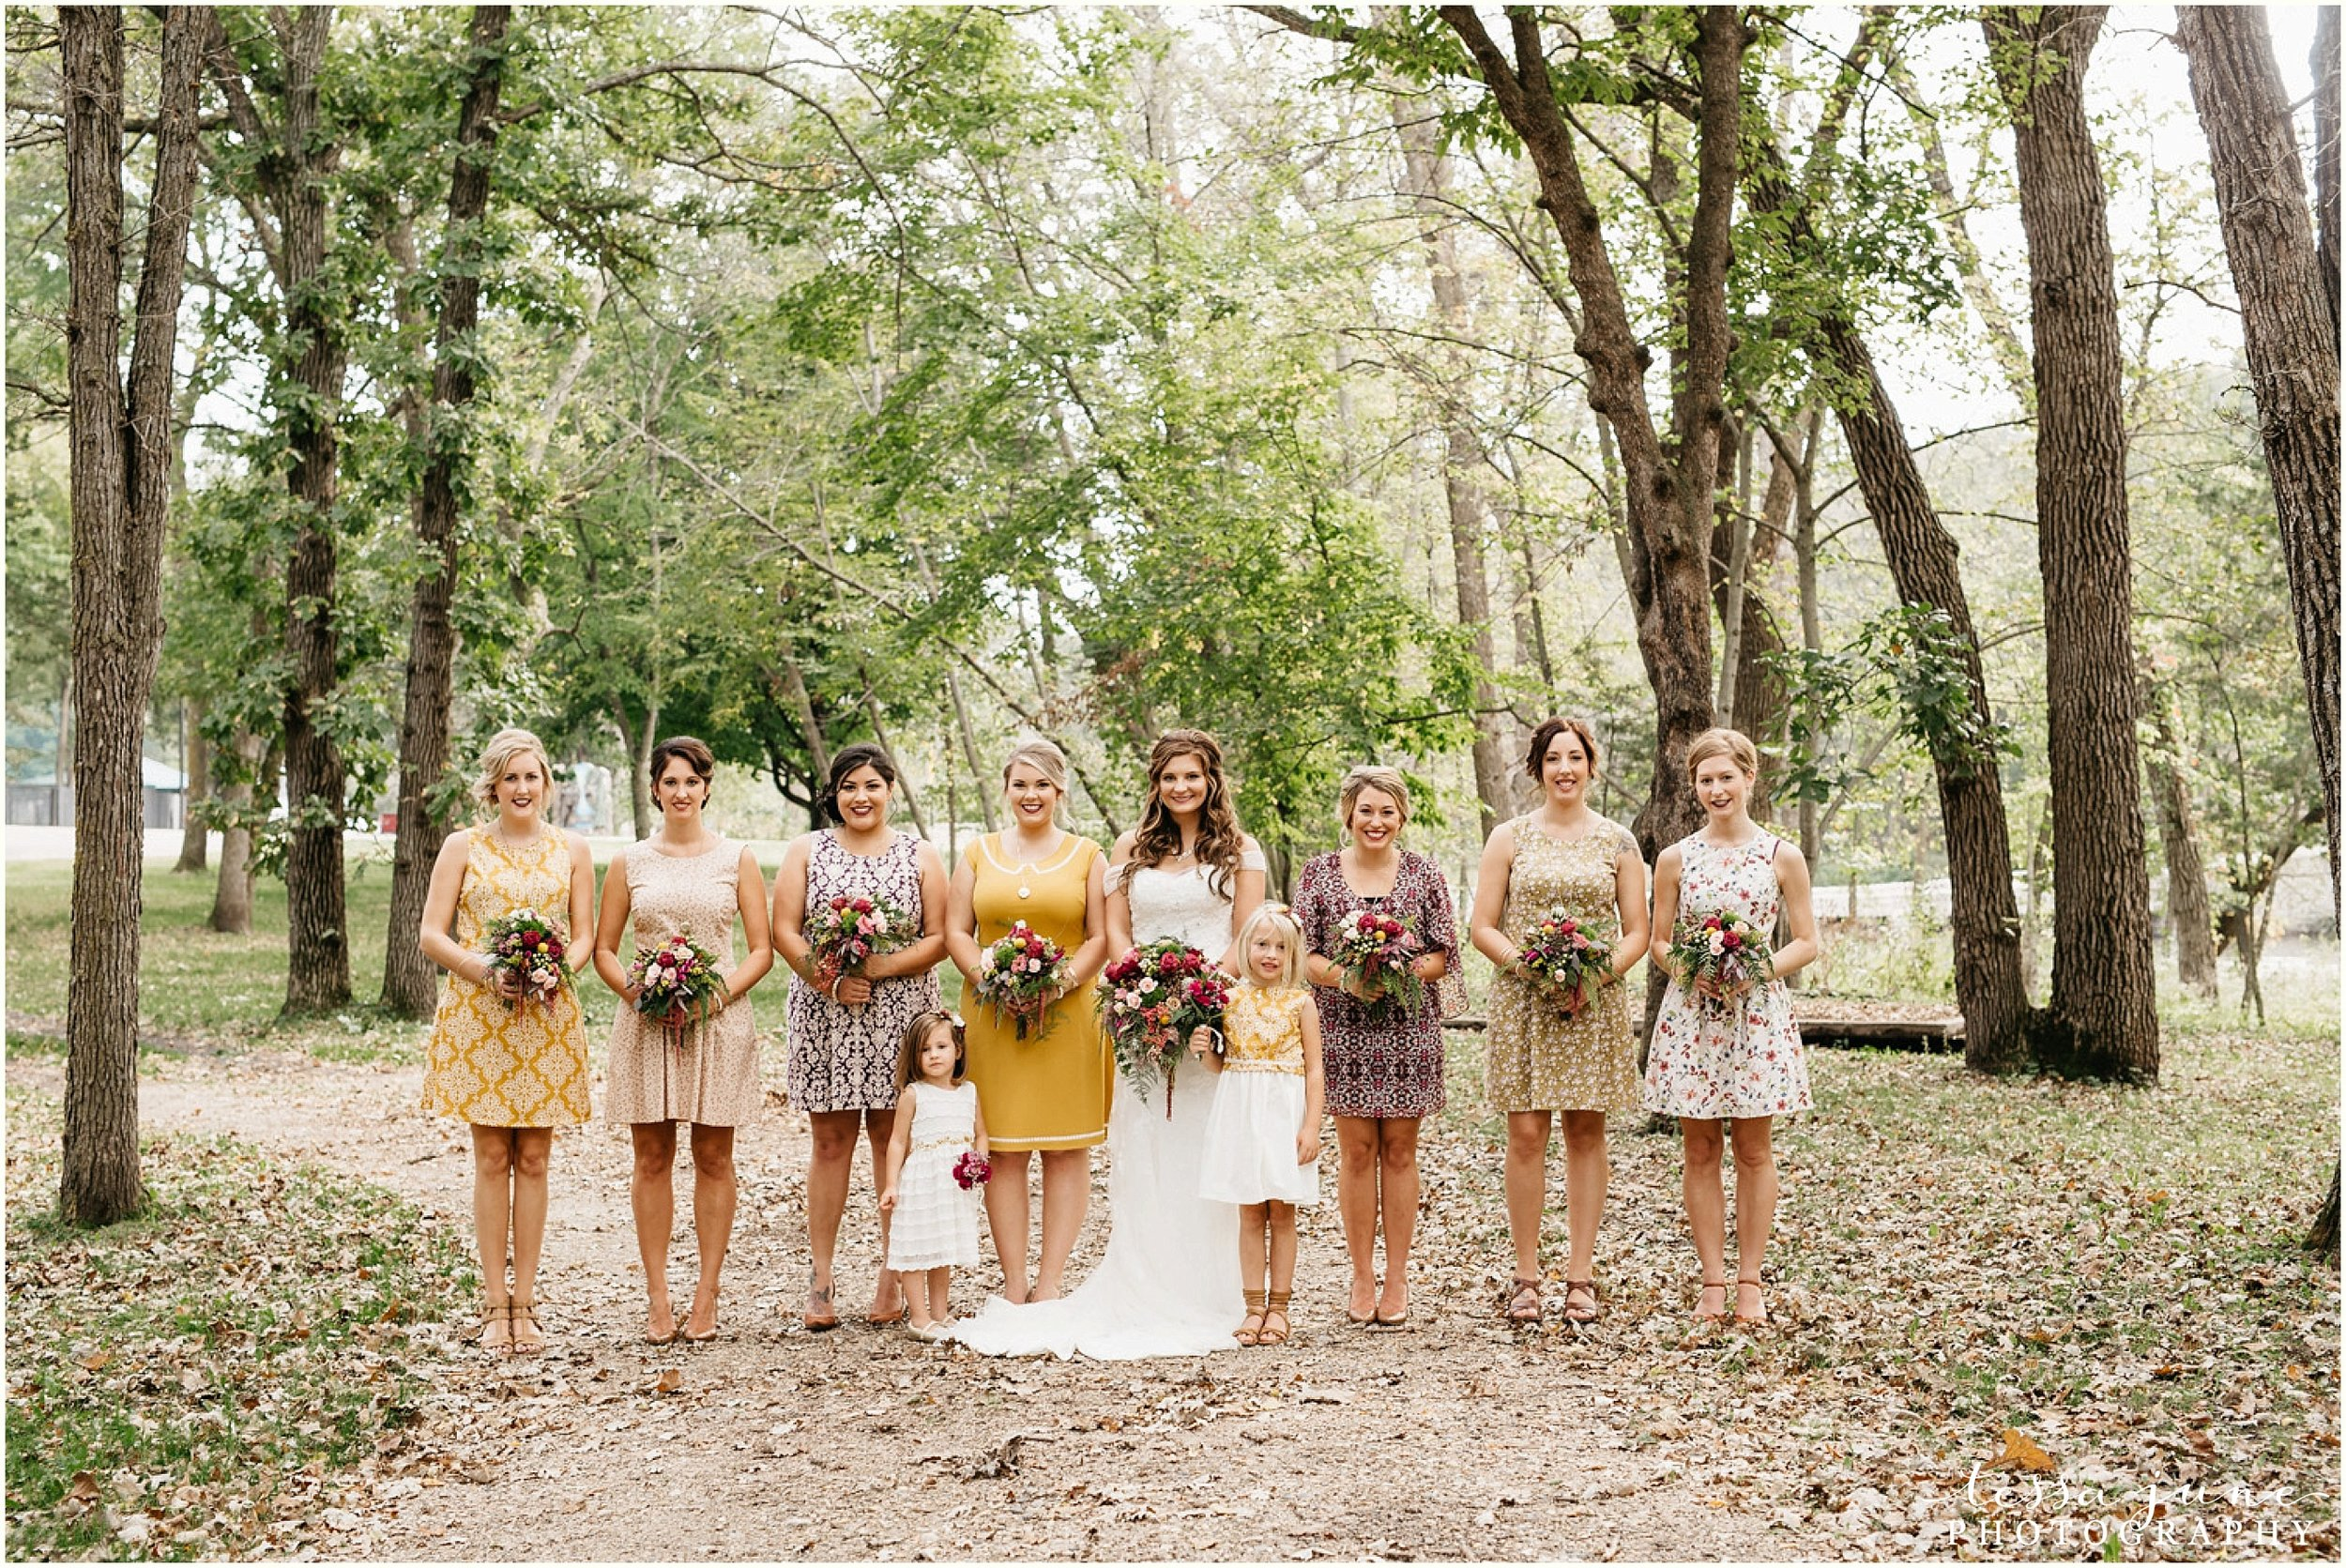 bohemian-minnesota-wedding-mismatched-bridesmaid-dresses-waterfall-st-cloud-tessa-june-photography-72.jpg